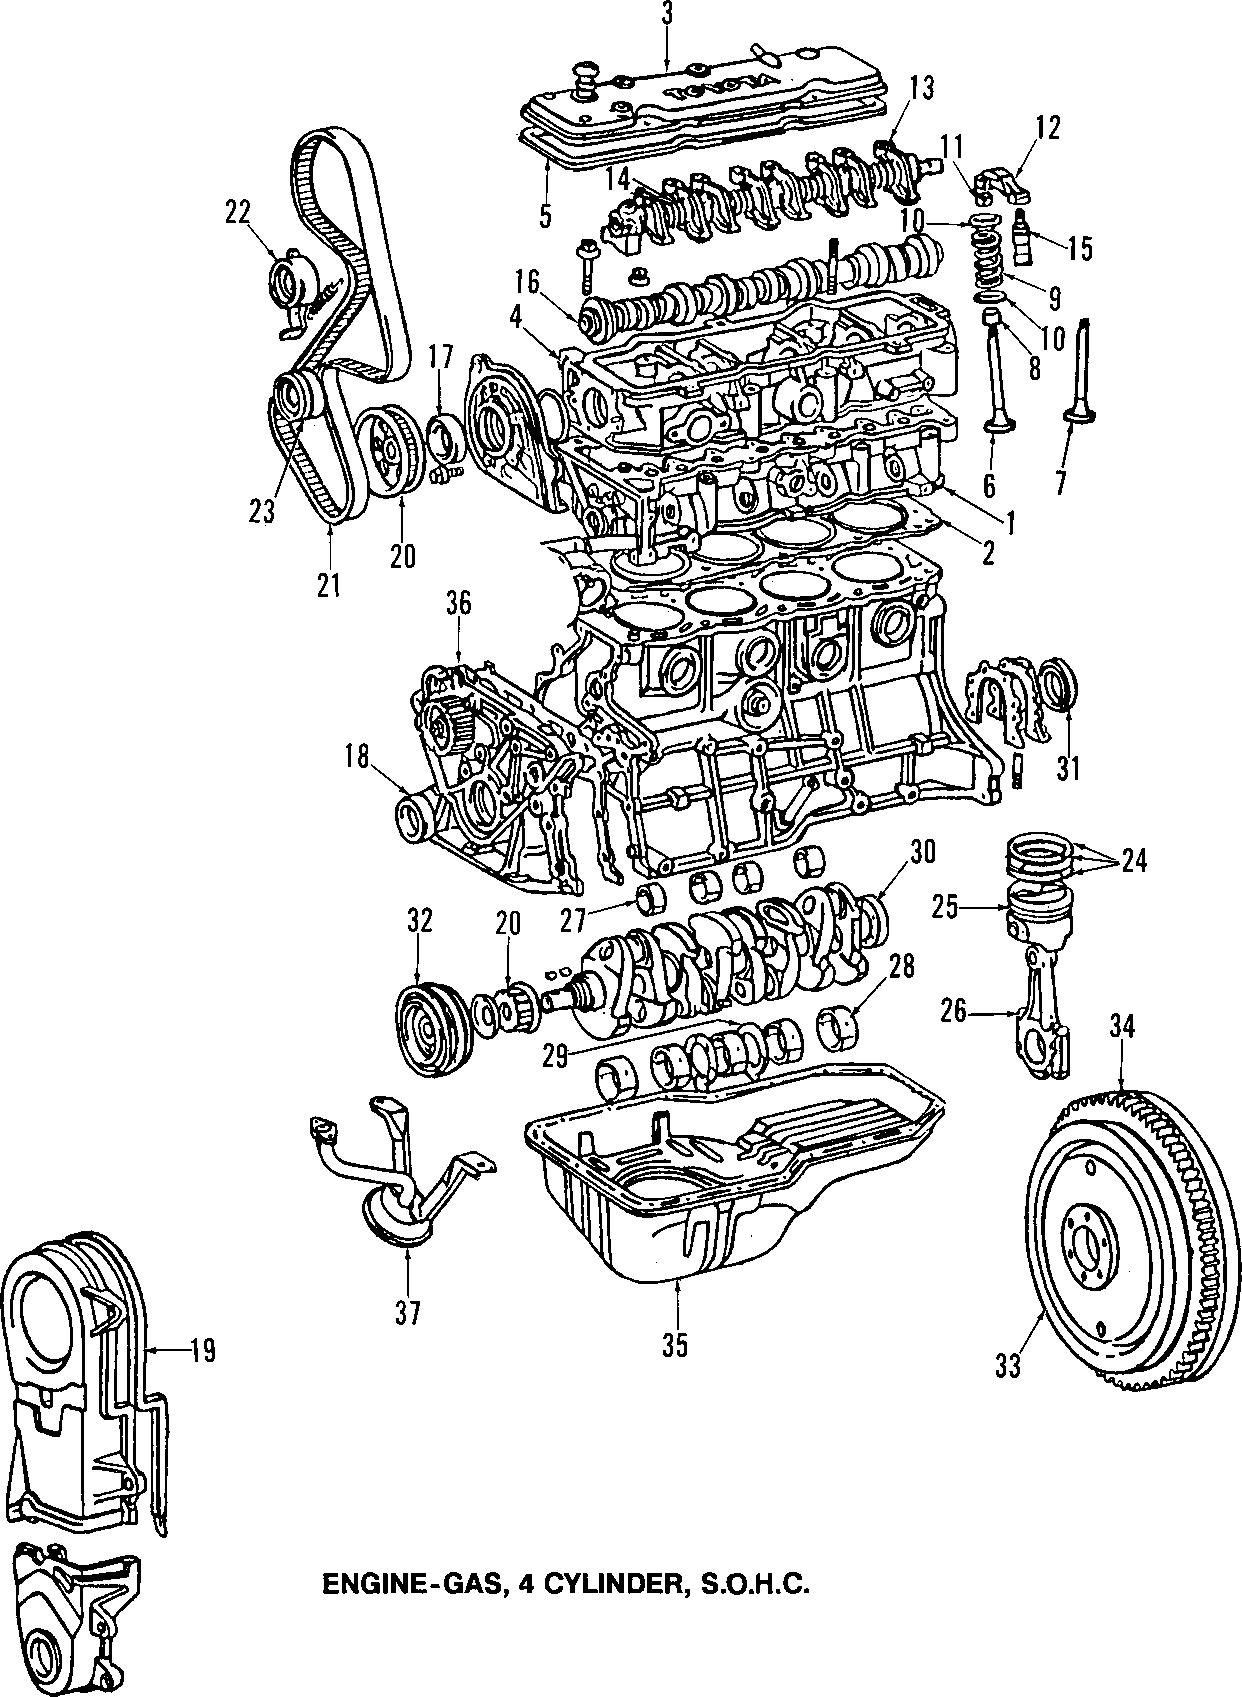 1988 TOYOTA COROLLA FX D (BASE) 1600CC, MANUAL Engine